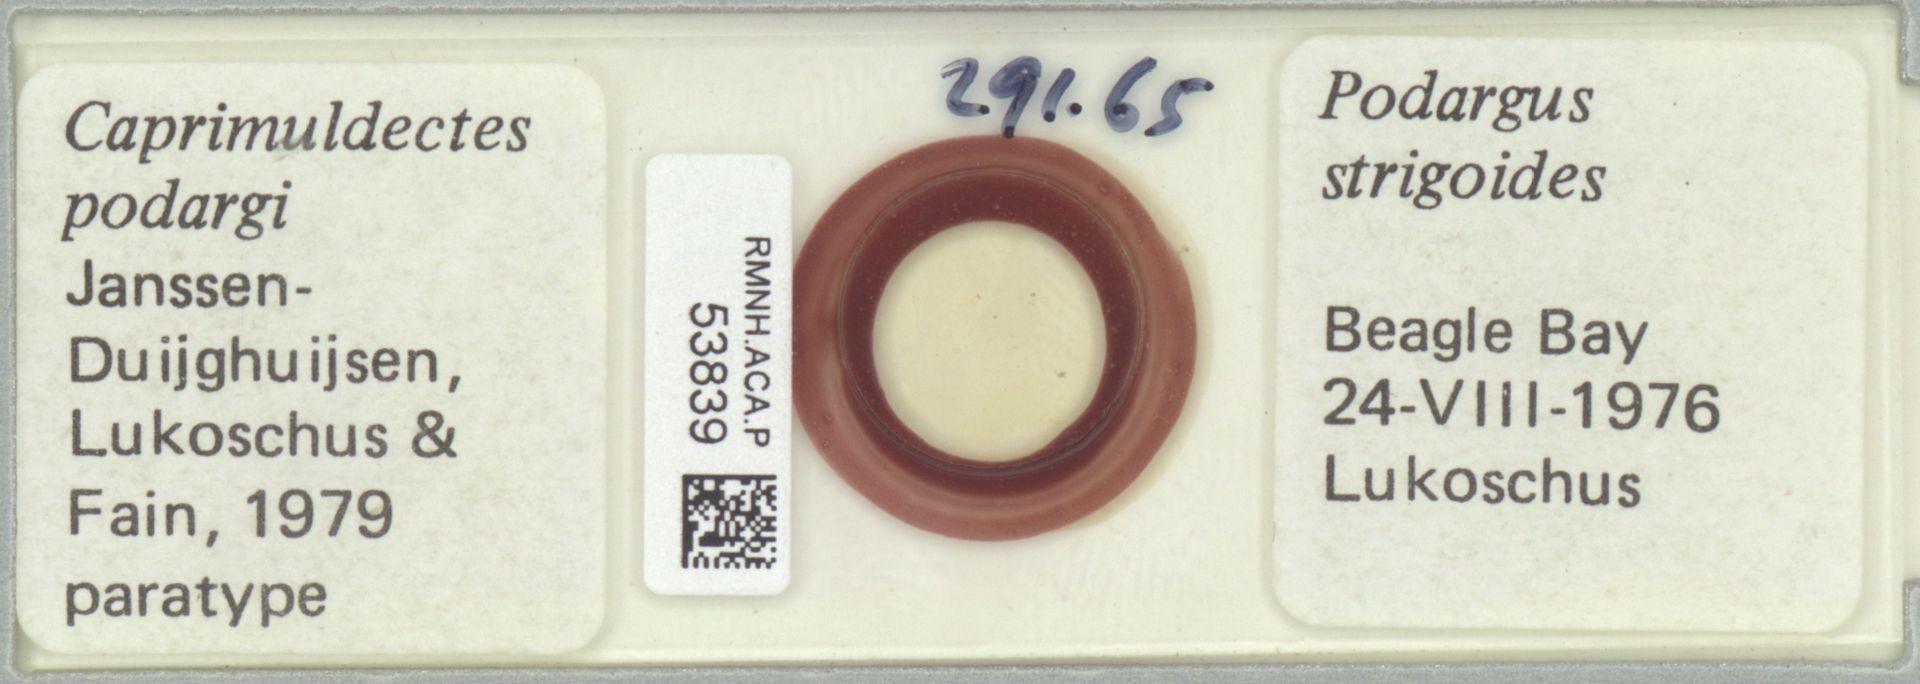 RMNH.ACA.P.53839 | Caprimuldectes podargi Janssen-Duijghuijsen, Lukoschus & Fain 1979